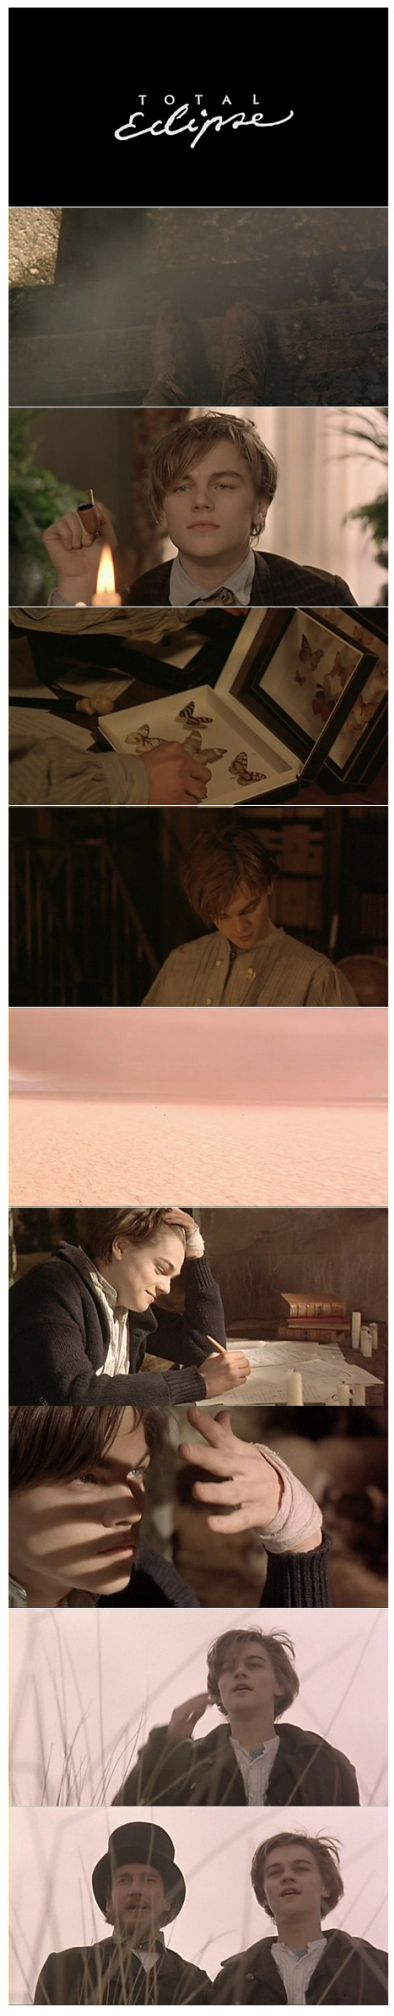 """Total Eclipse"" (1995) >> Leonardo DiCaprio & David Thewlis ... #WantToSee"